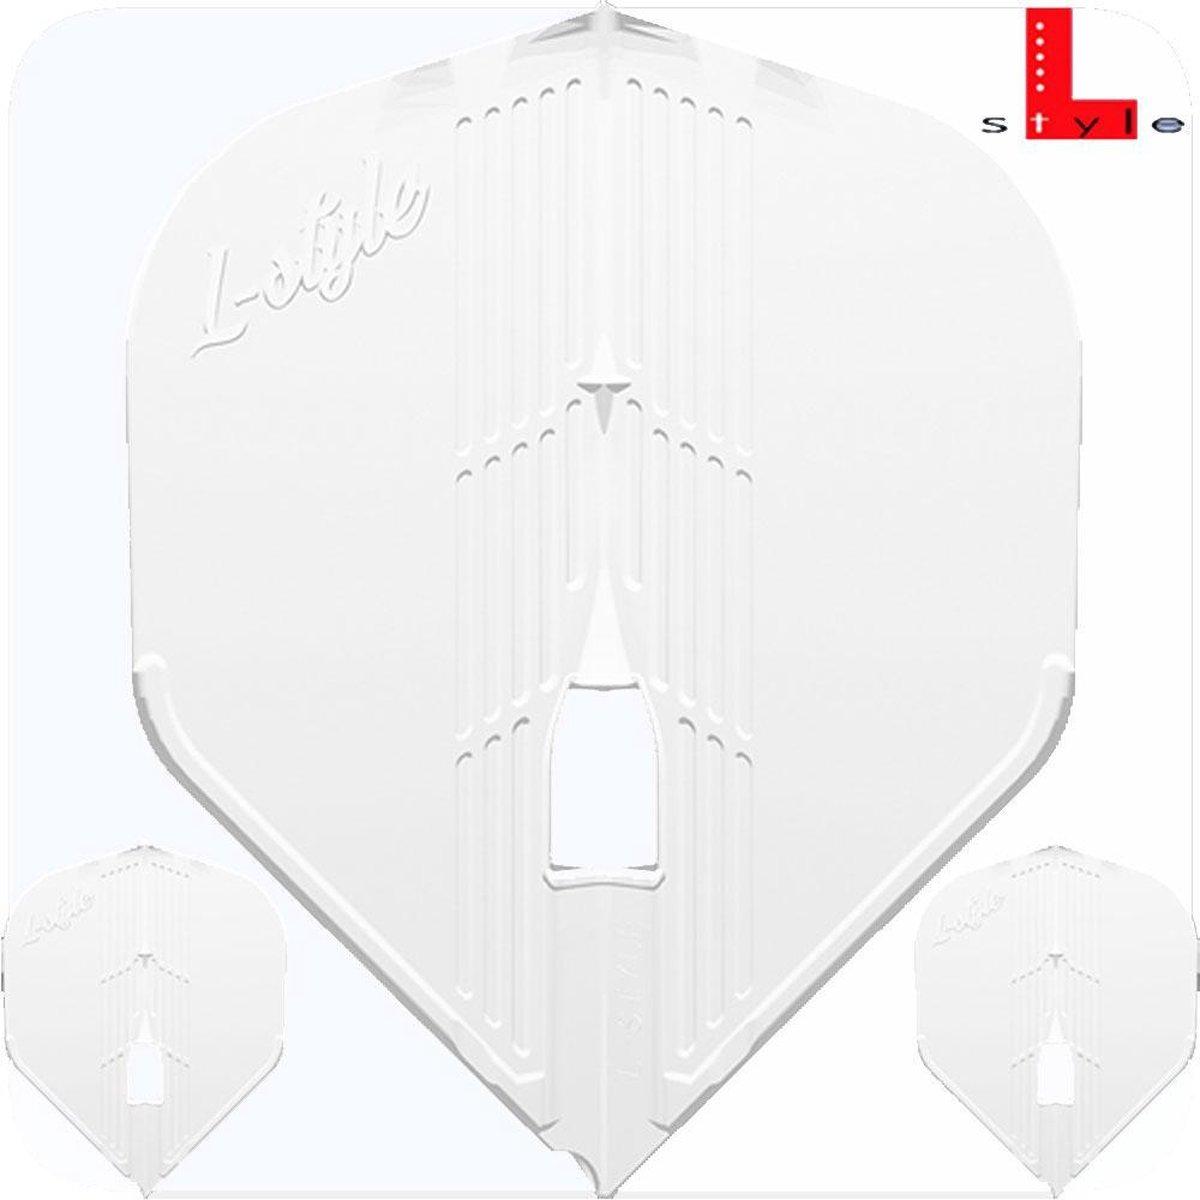 L-Style Champagne Flight Kami L1 Standard White